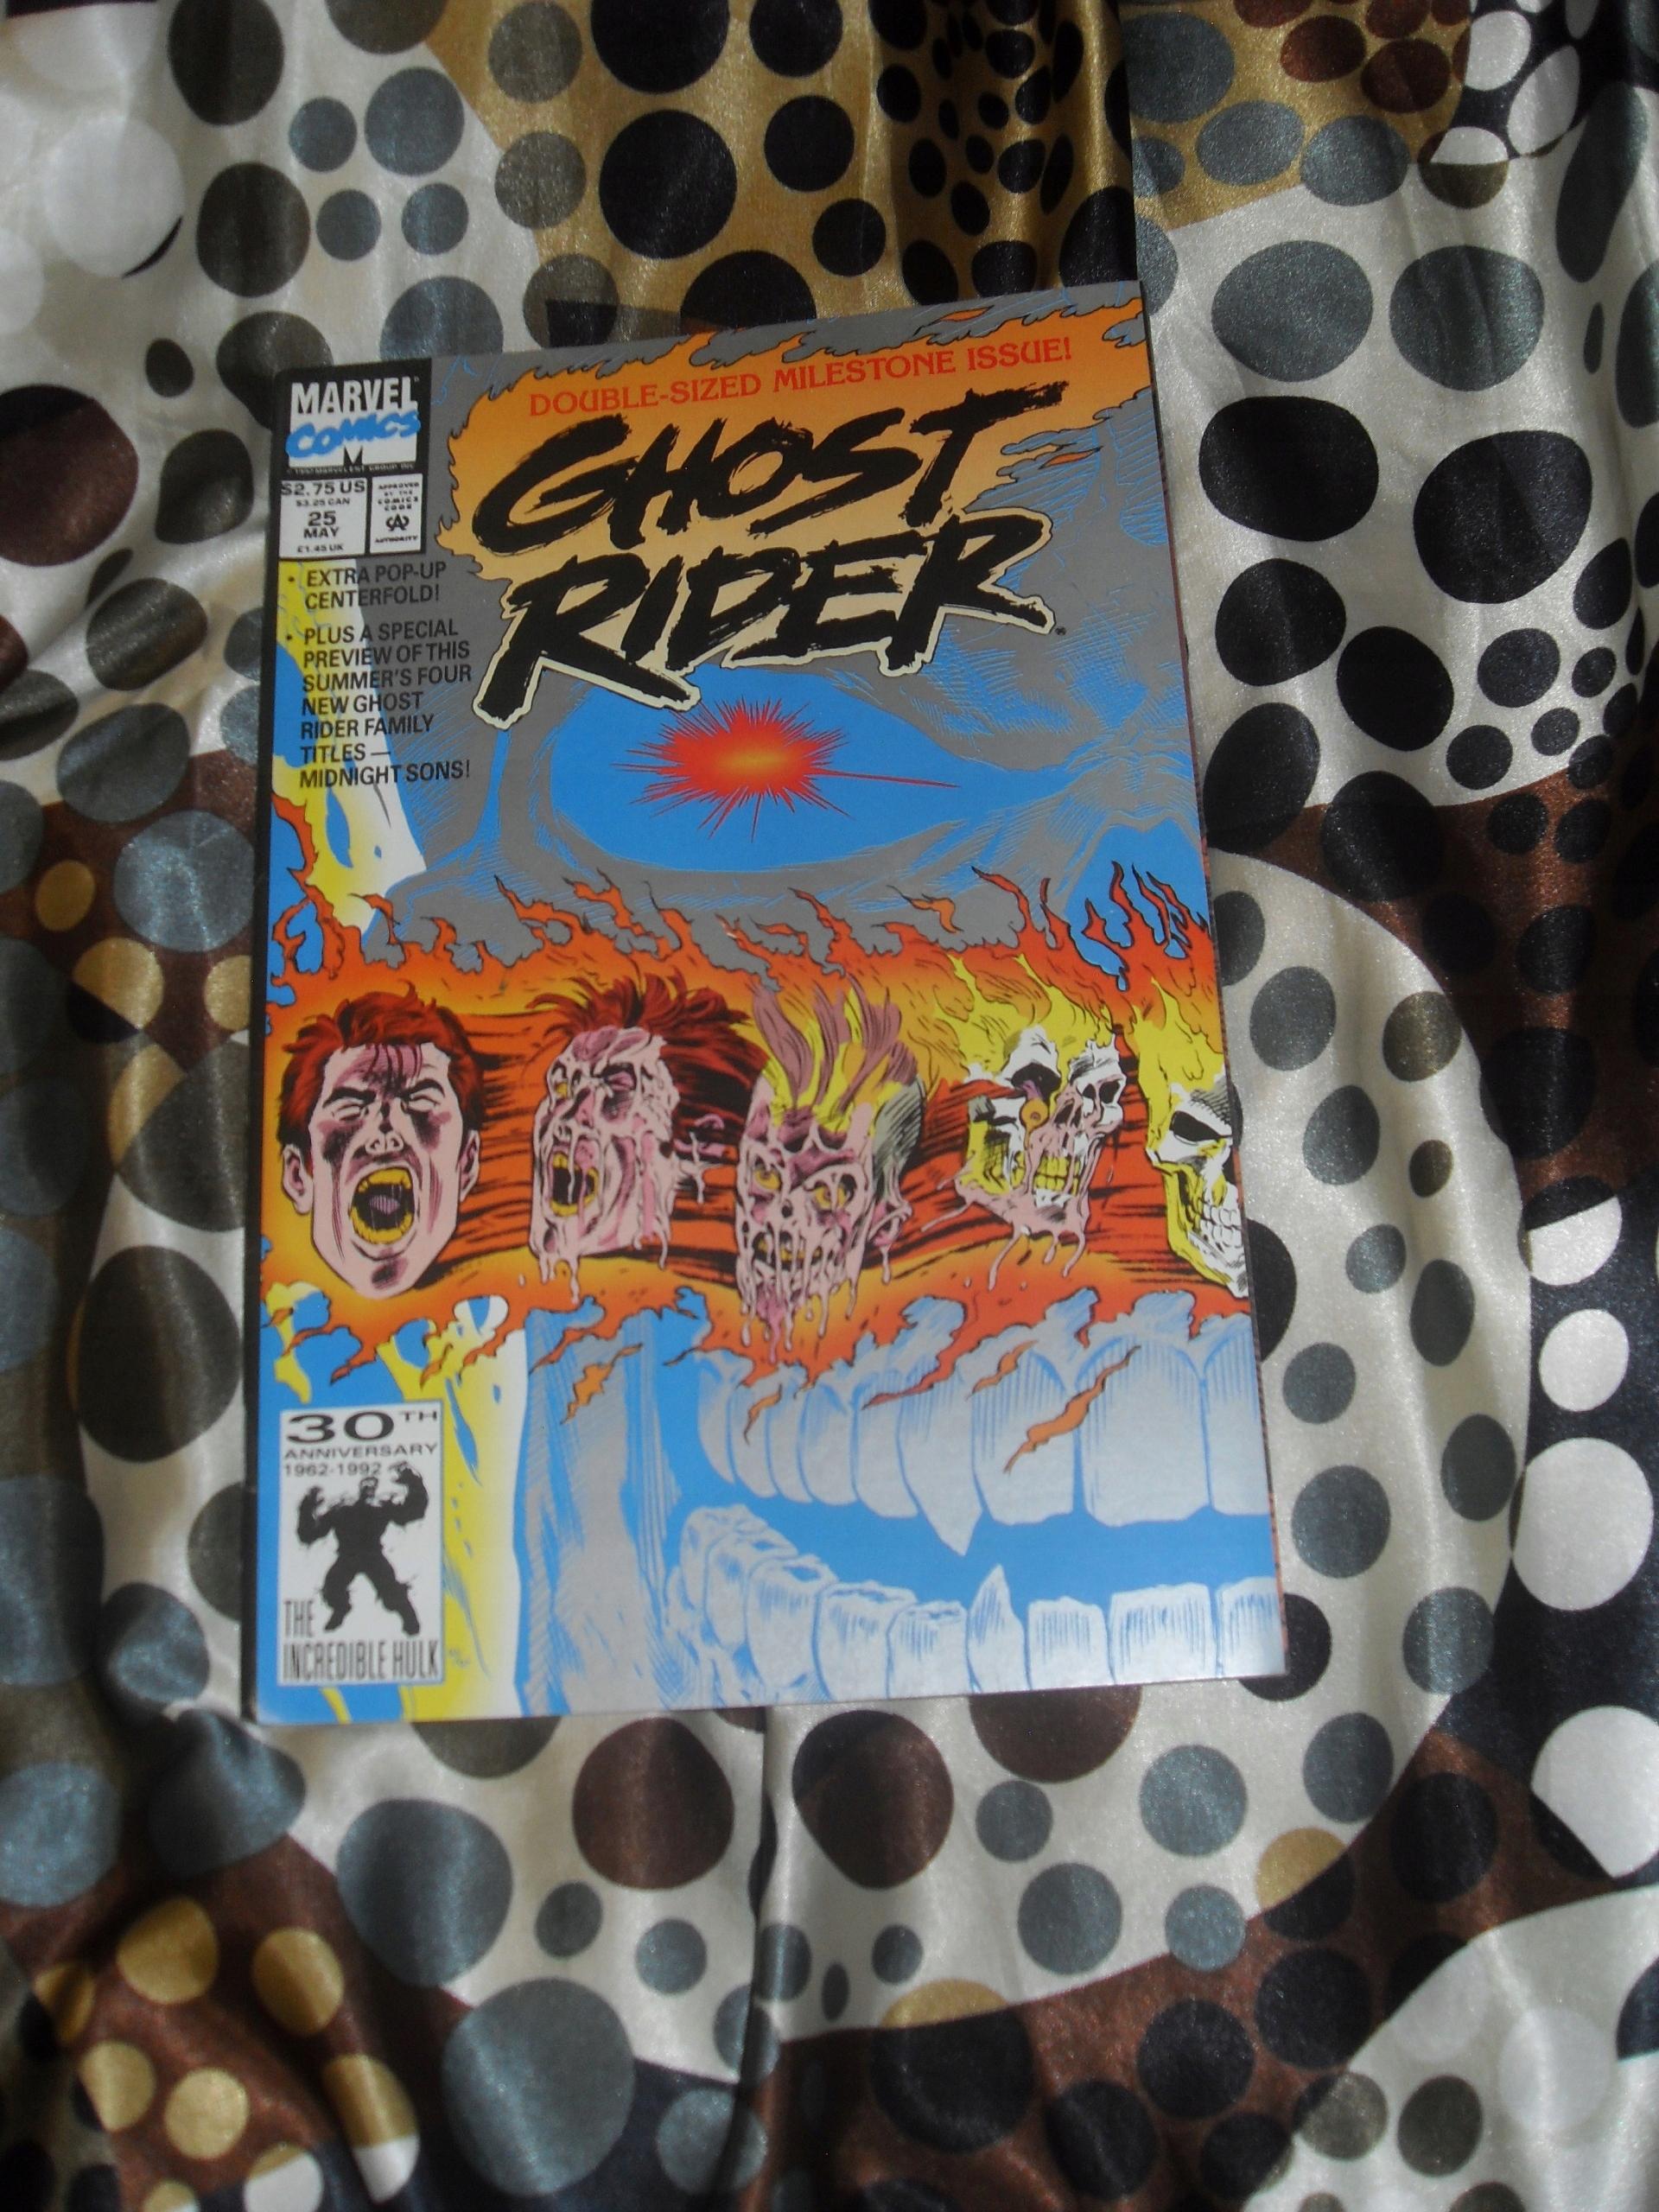 GHOST RIDER 1992 Vol.2 z rozkładanką pop up